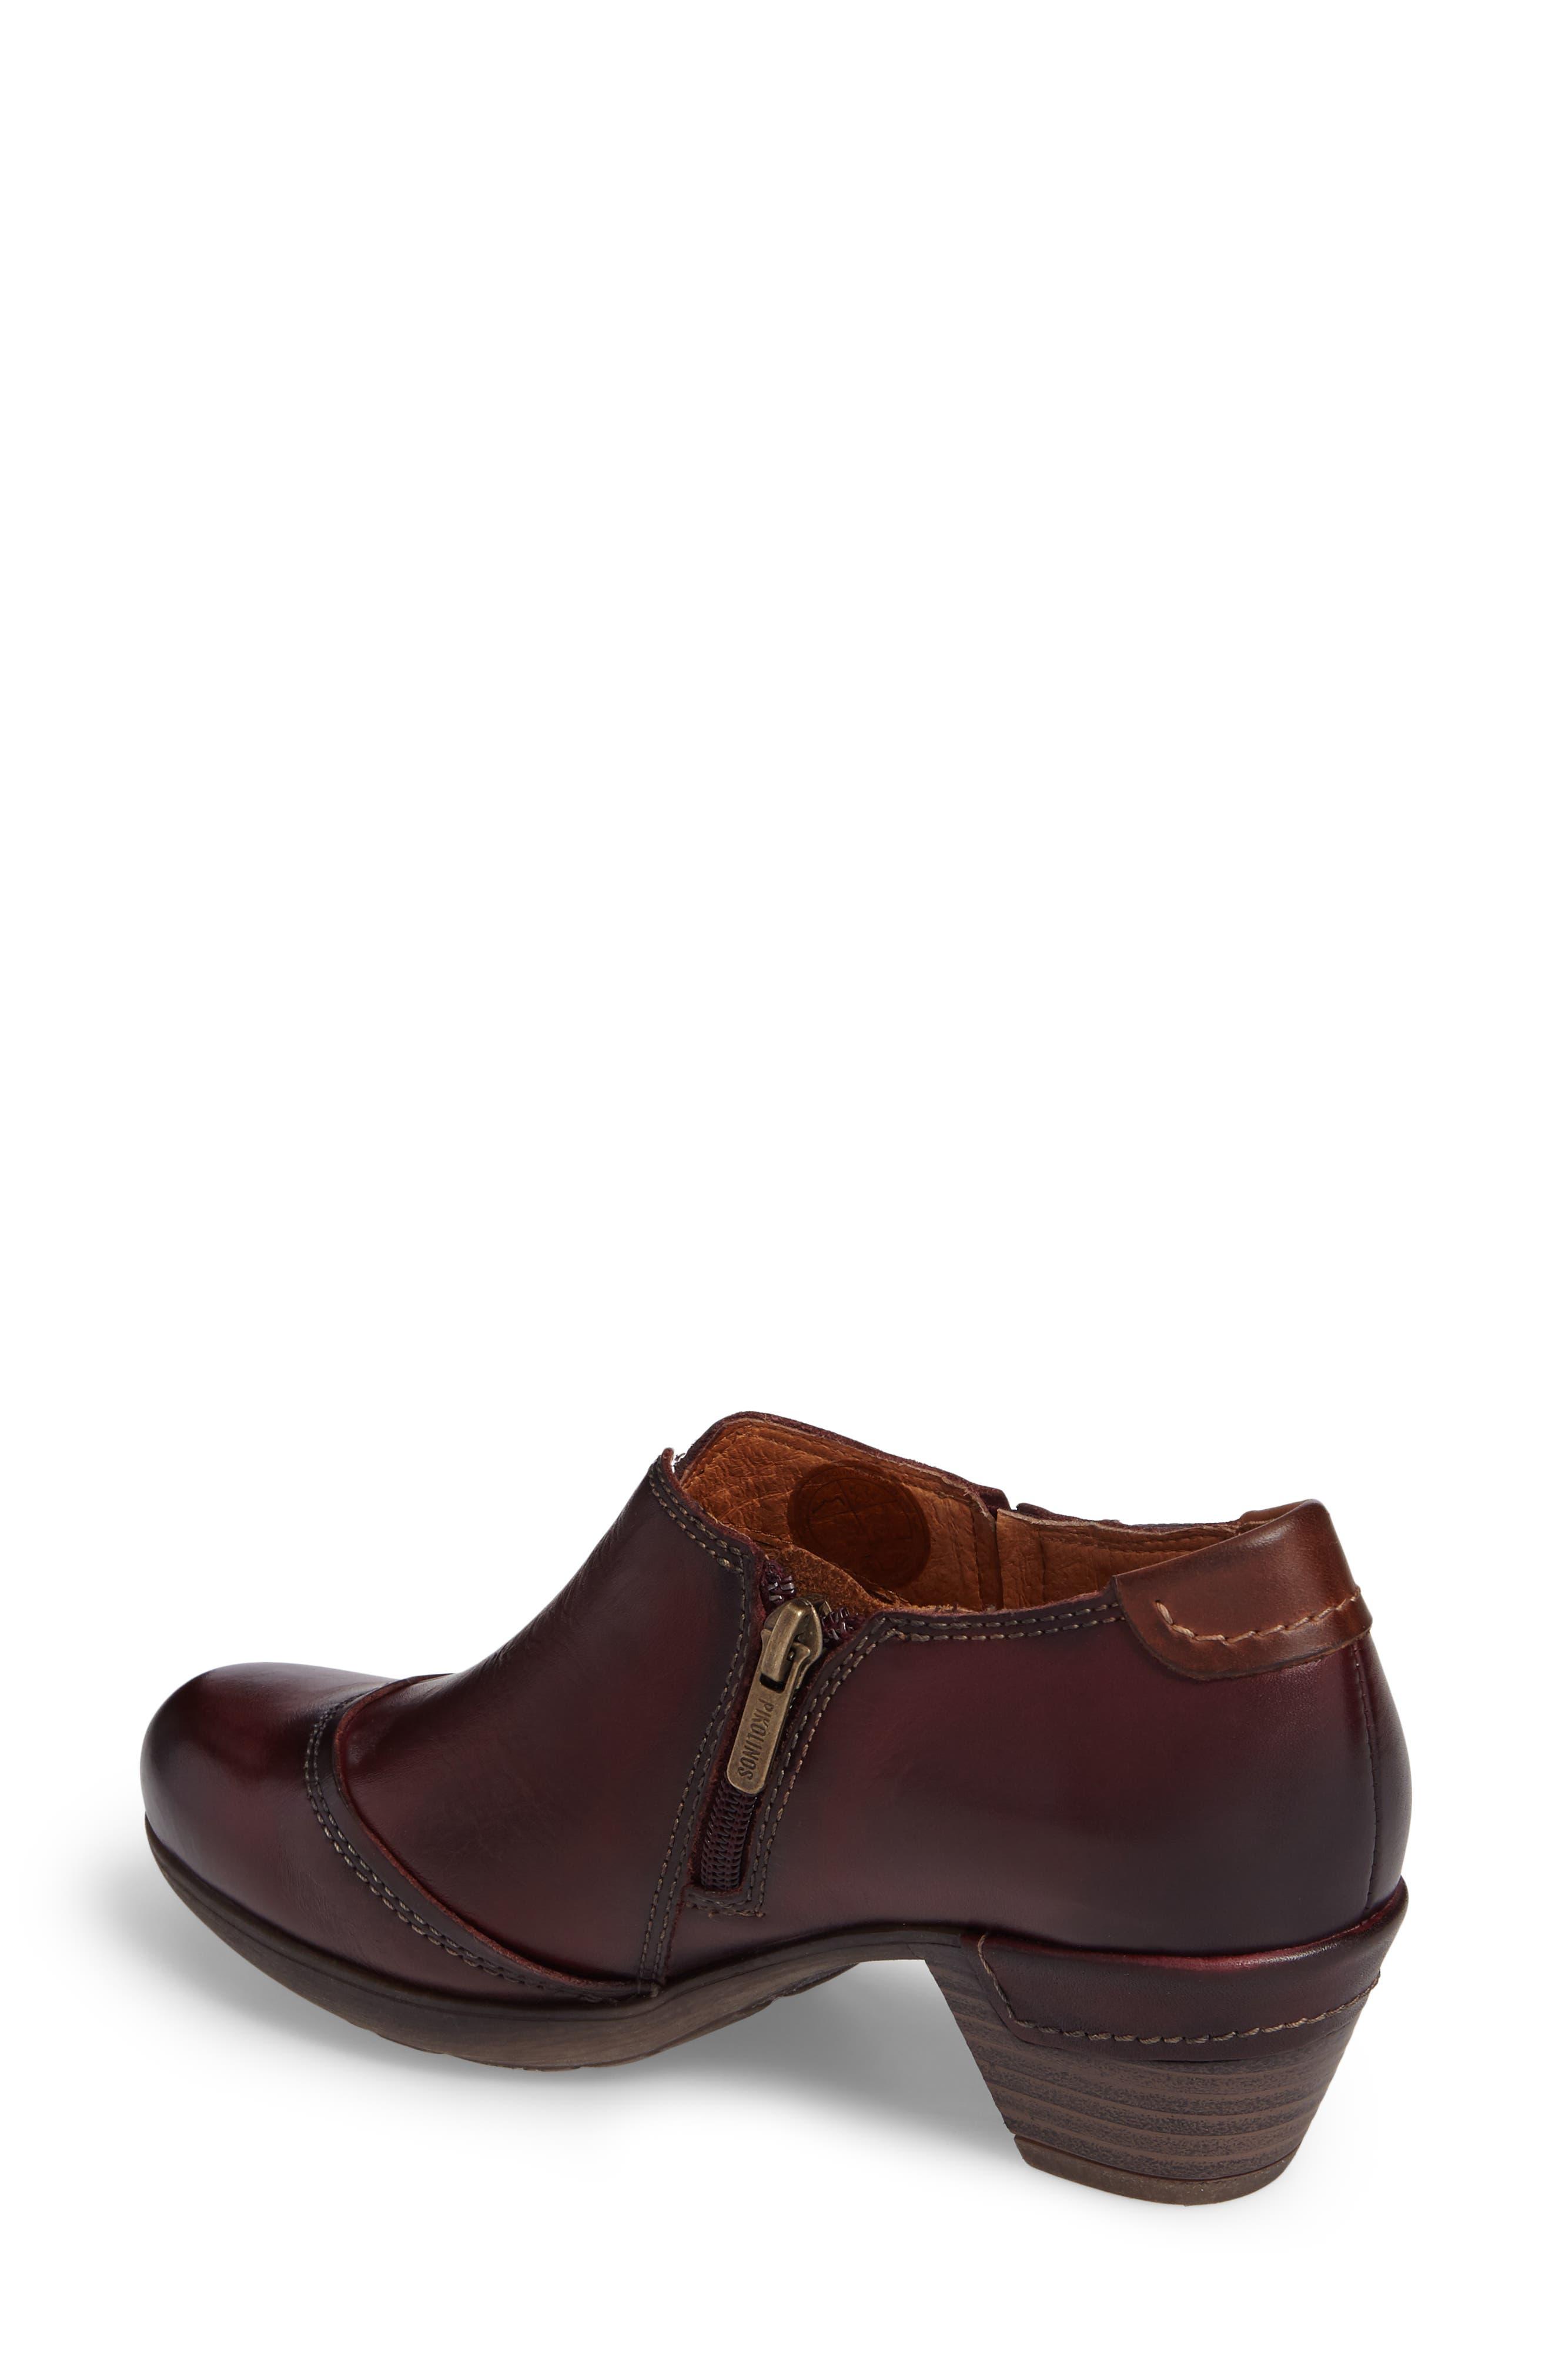 Rotterdam Bootie,                             Alternate thumbnail 2, color,                             Garnet Cuero Leather